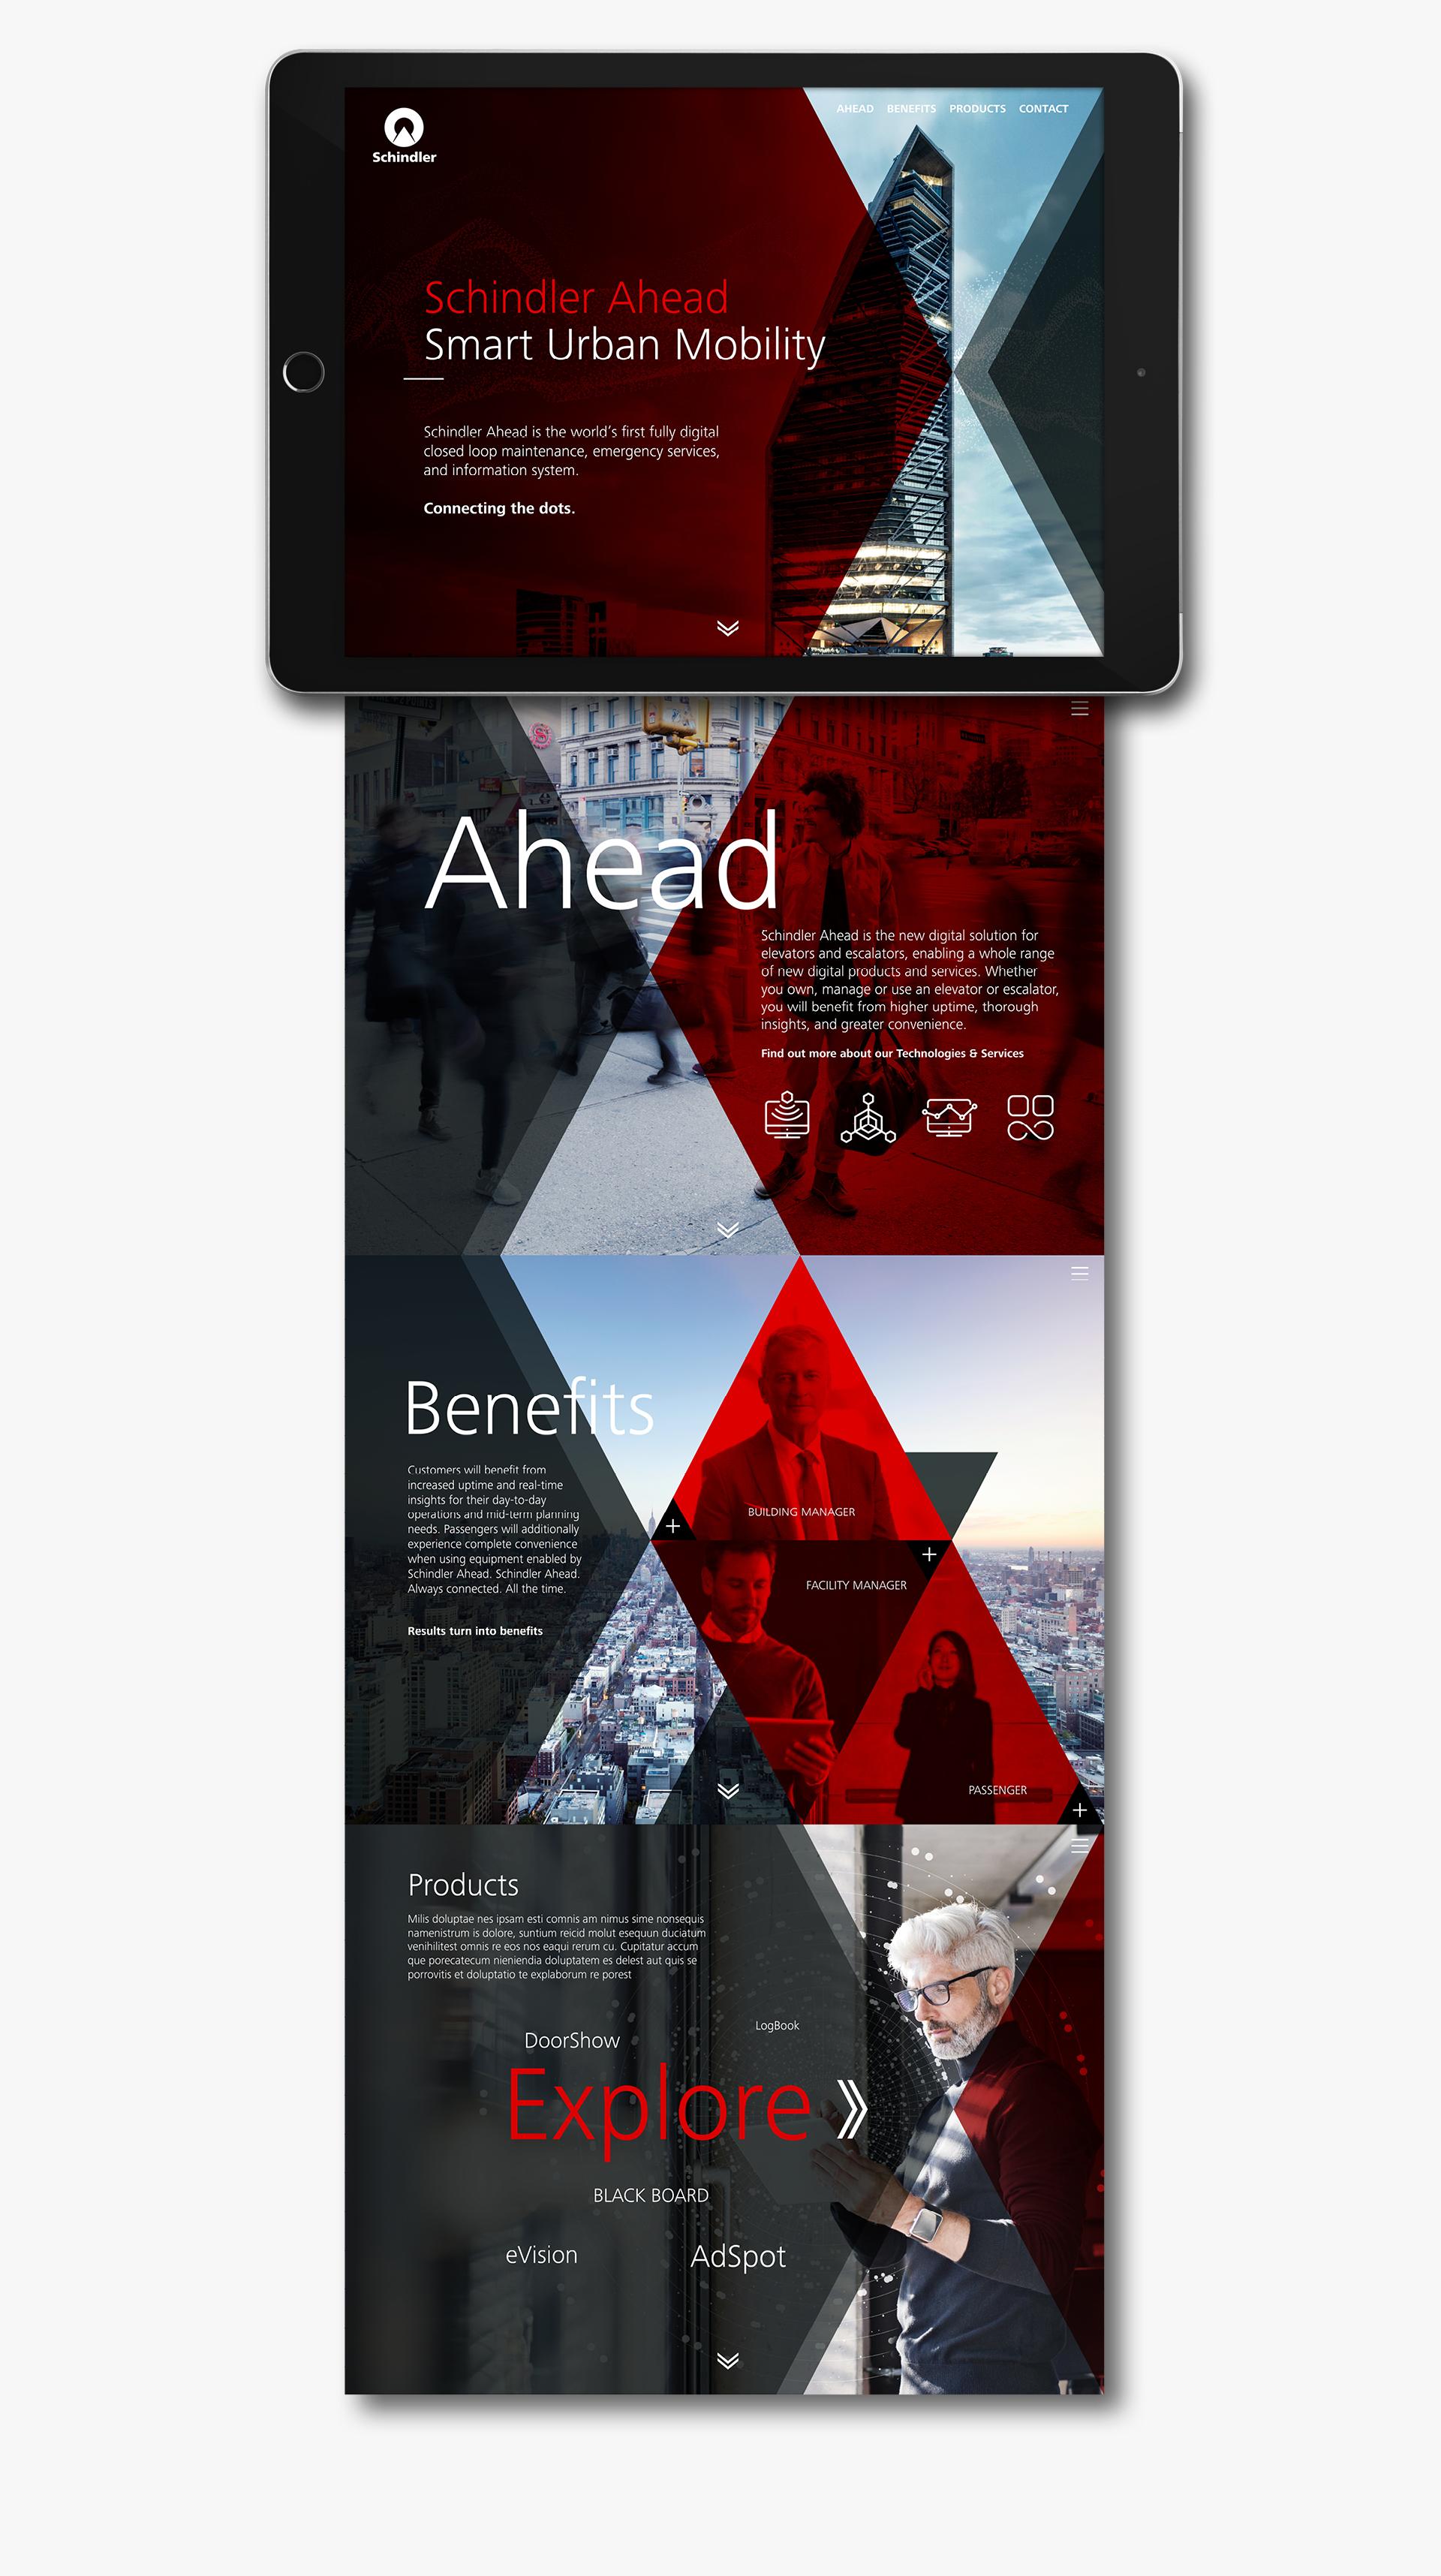 _Kreuzer-Design_SDB_1920x1350_Web.jpg